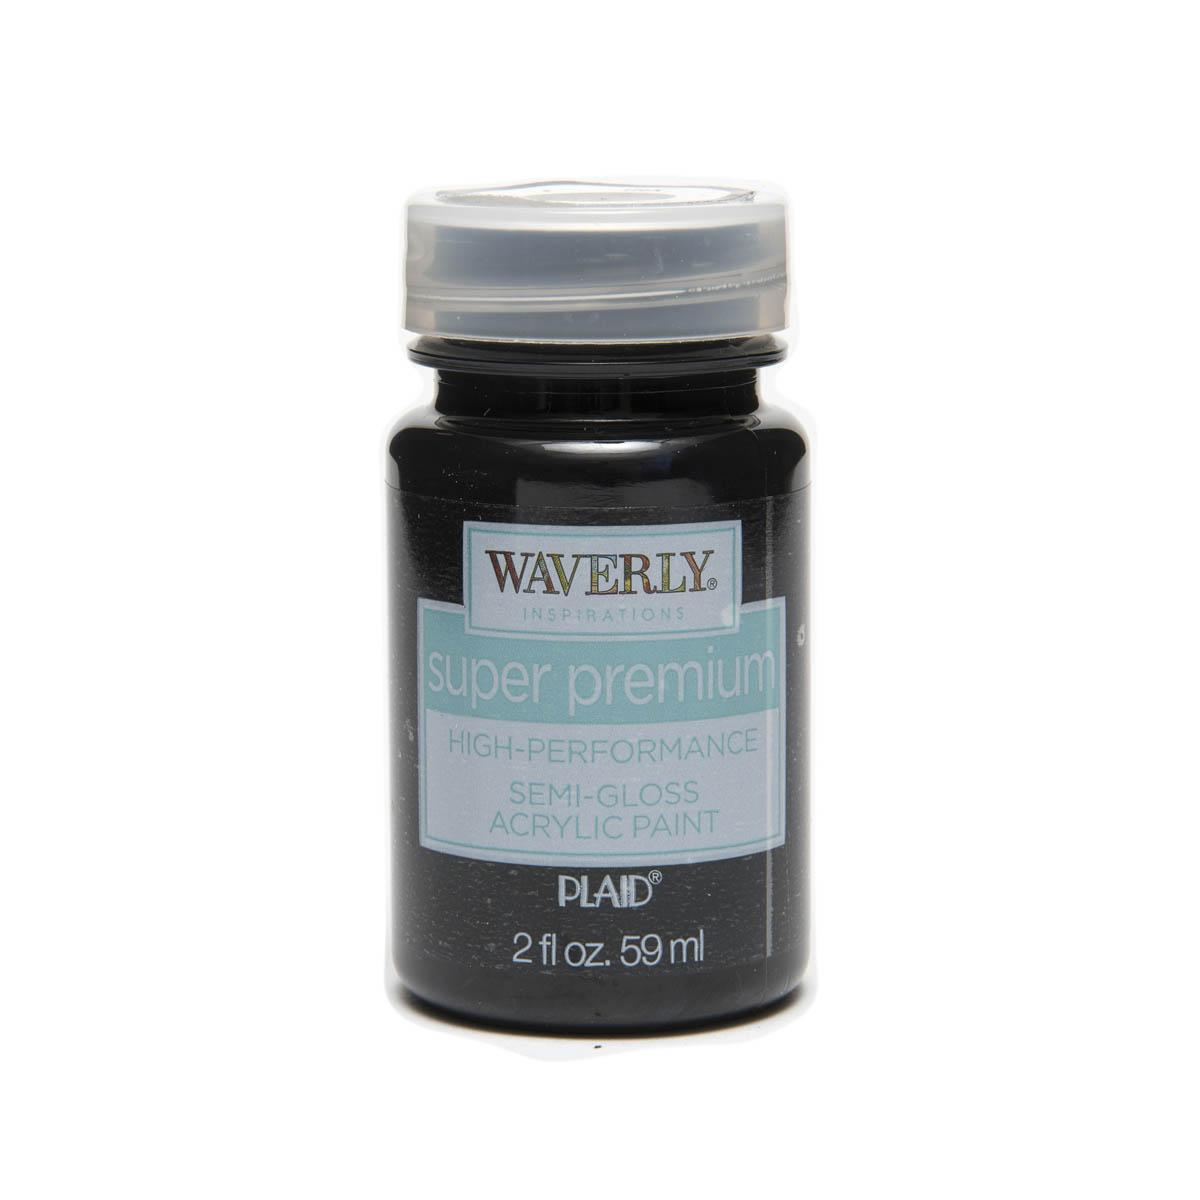 Waverly ® Inspirations Super Premium Semi-Gloss Acrylic Paint - Ink, 2 oz. - 60659E